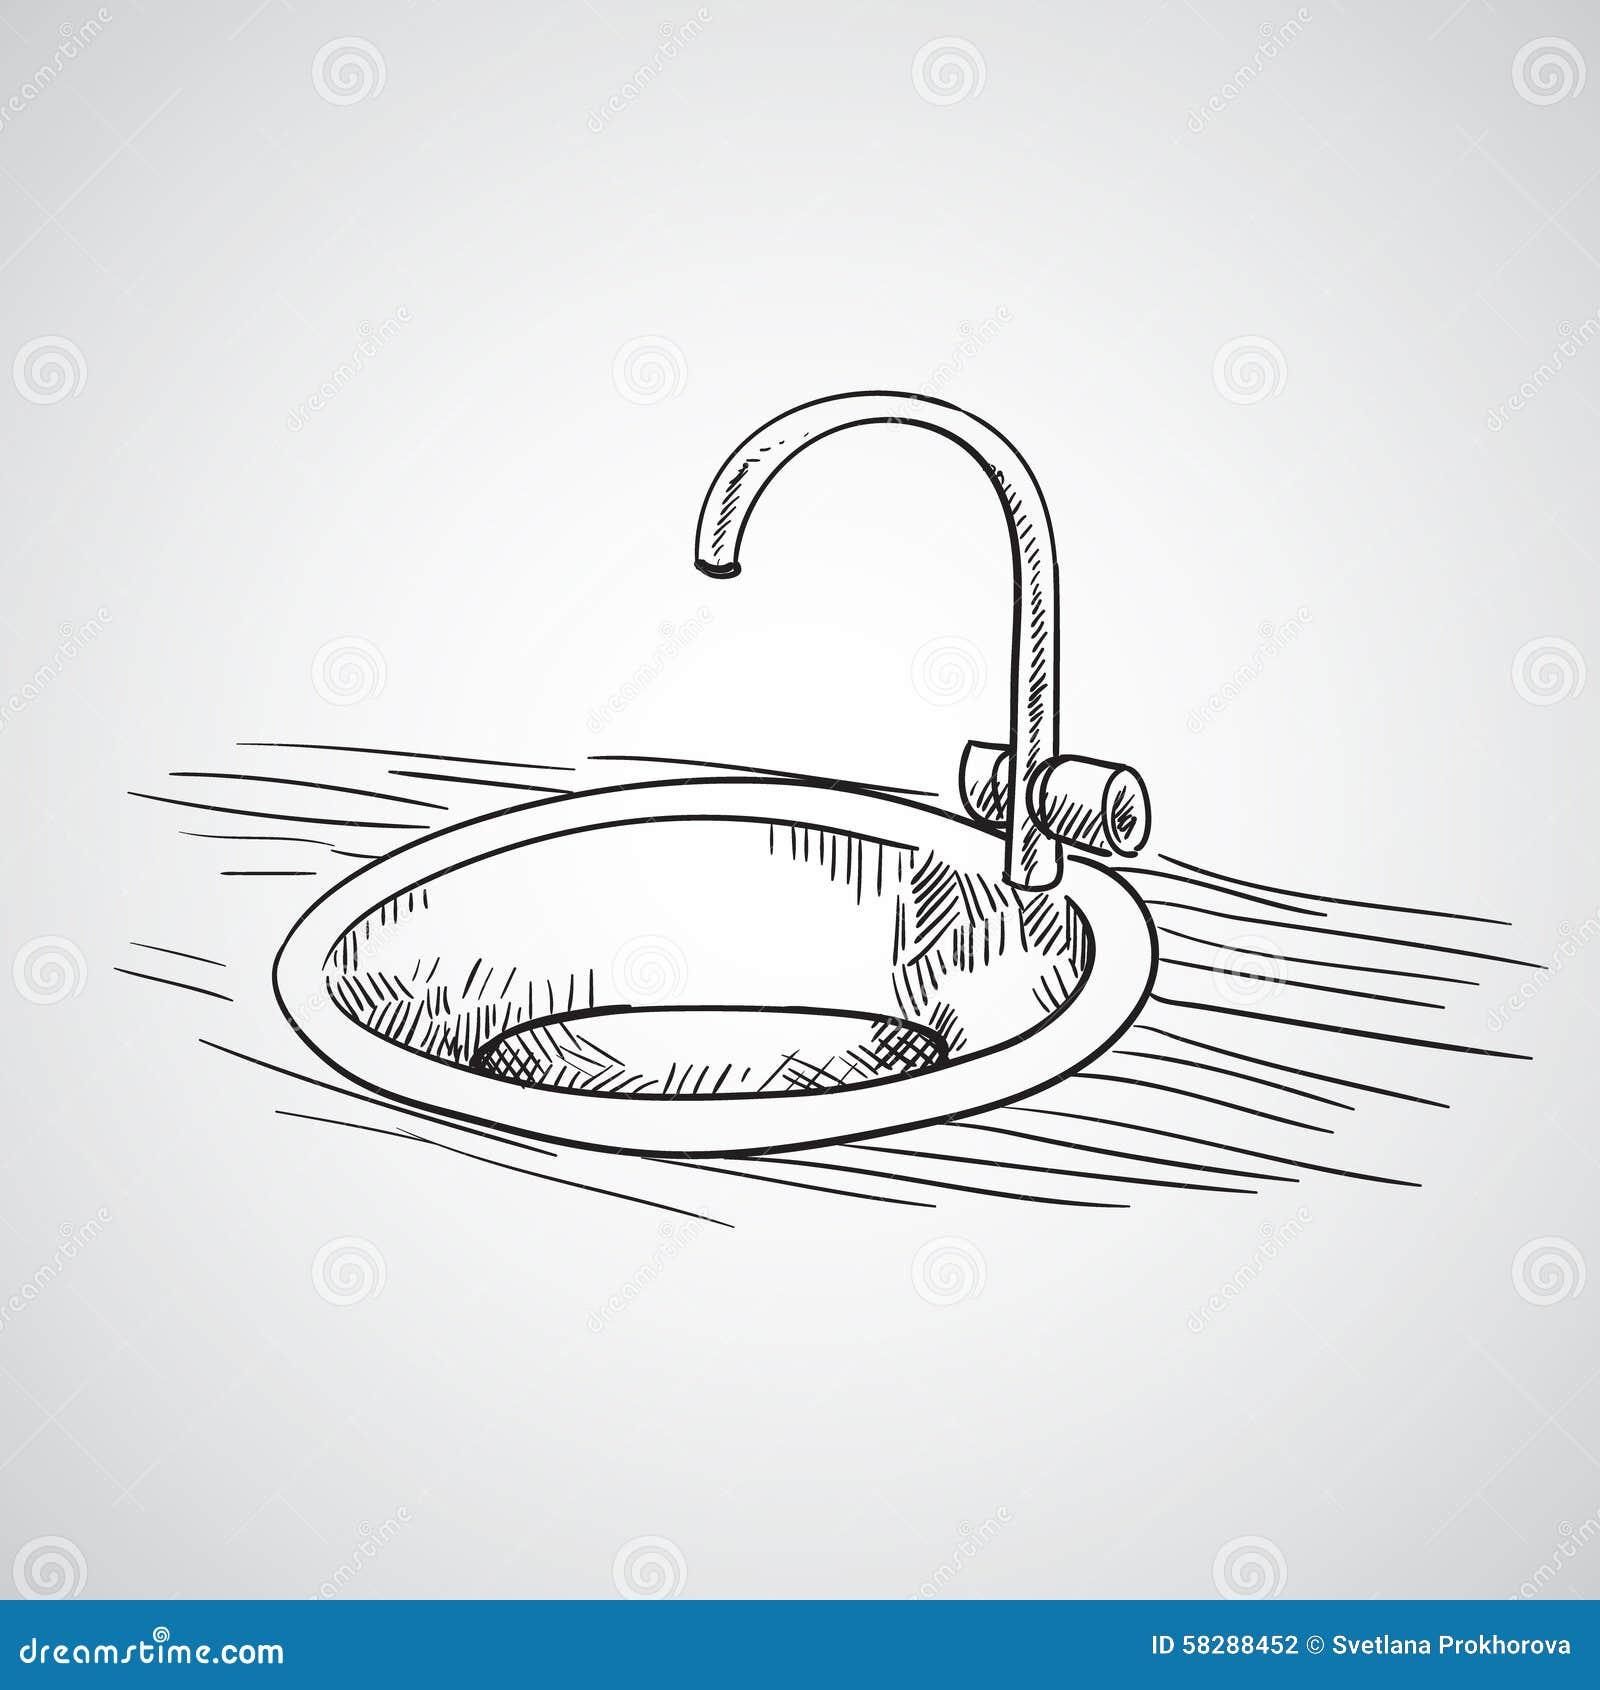 Bathroom sink drawing - Hand Drawn Sketch Hand Drawn Sketch Stock Vector Image 58288452